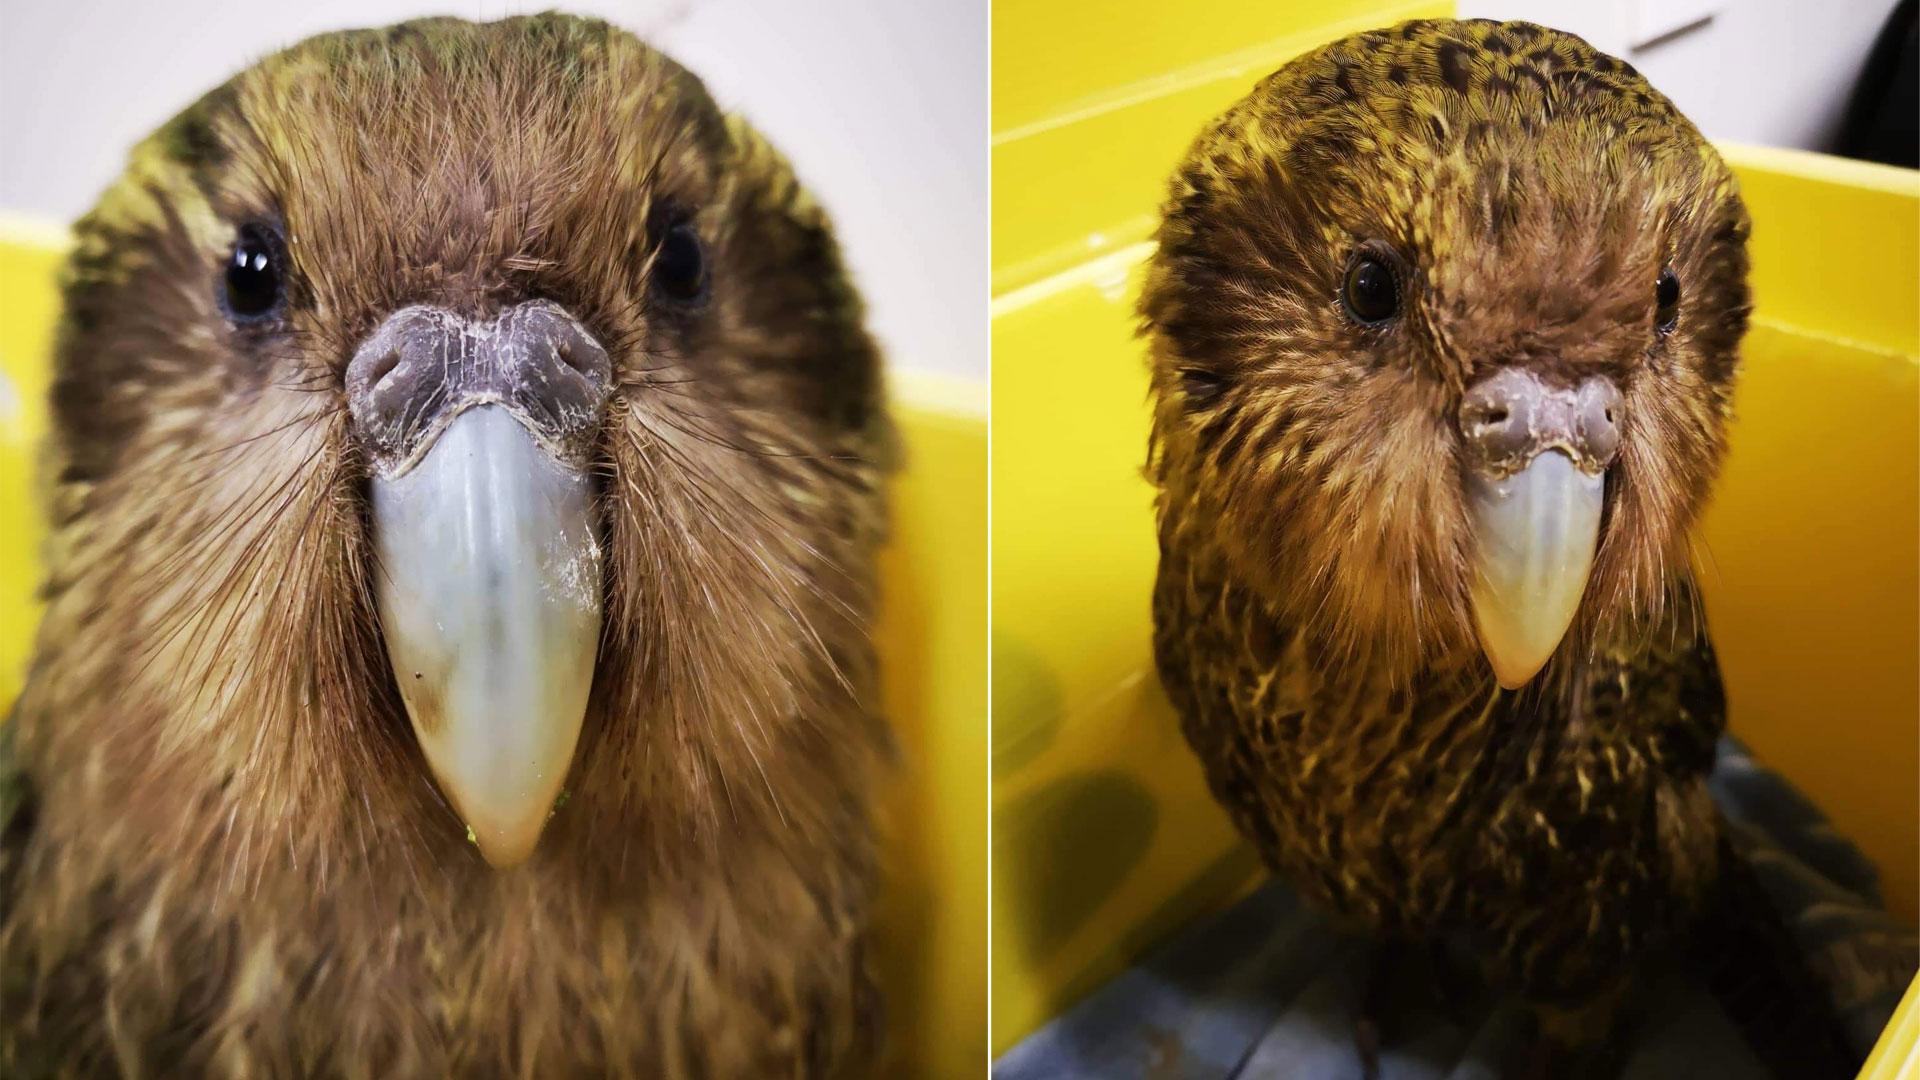 https://rfacdn.nz/zoo/assets/media/kakapo-gallery-7.jpg